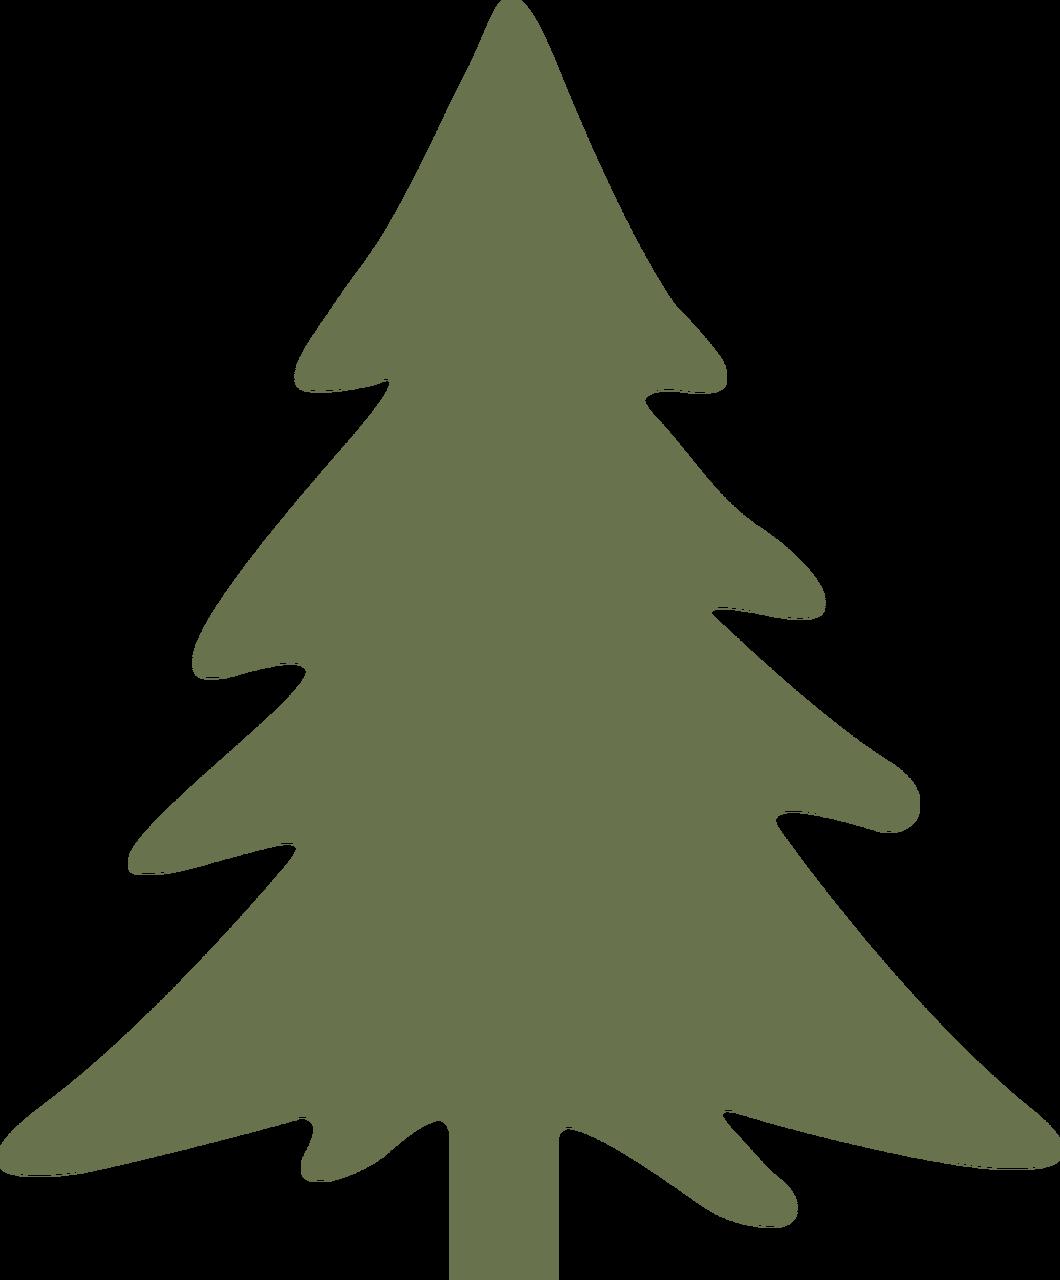 Download 21+ Free Pine Tree Svg Pics Free SVG files | Silhouette ...